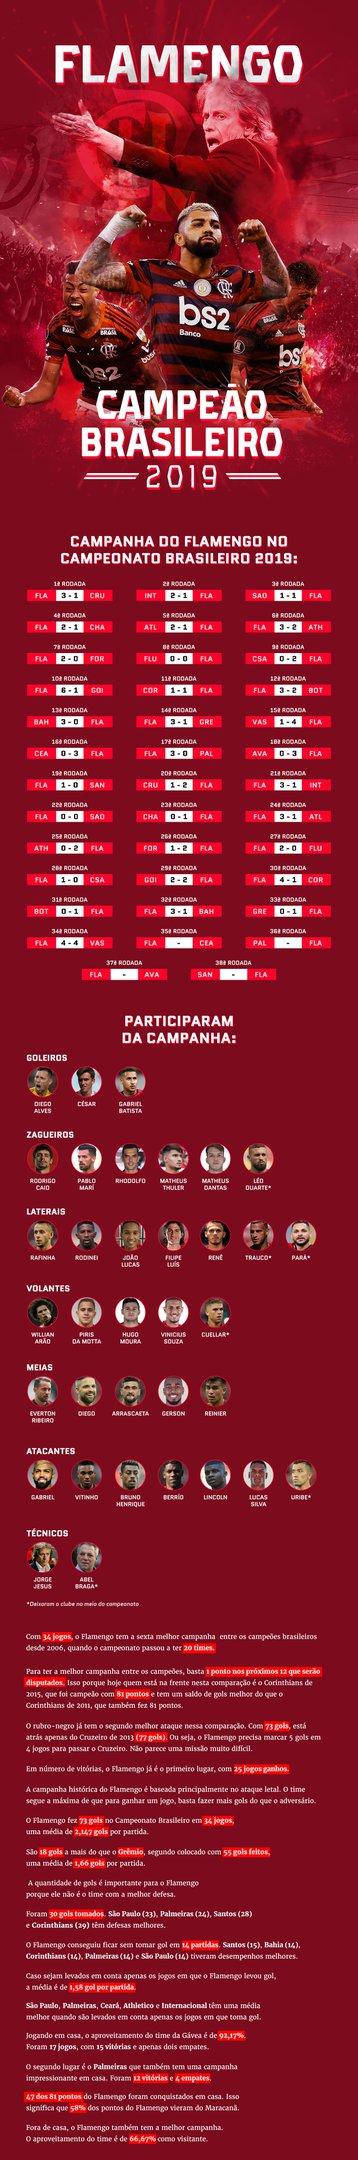 Flamengo Campeao Brasileiro 2019 Confira O Raio X Da Campanha